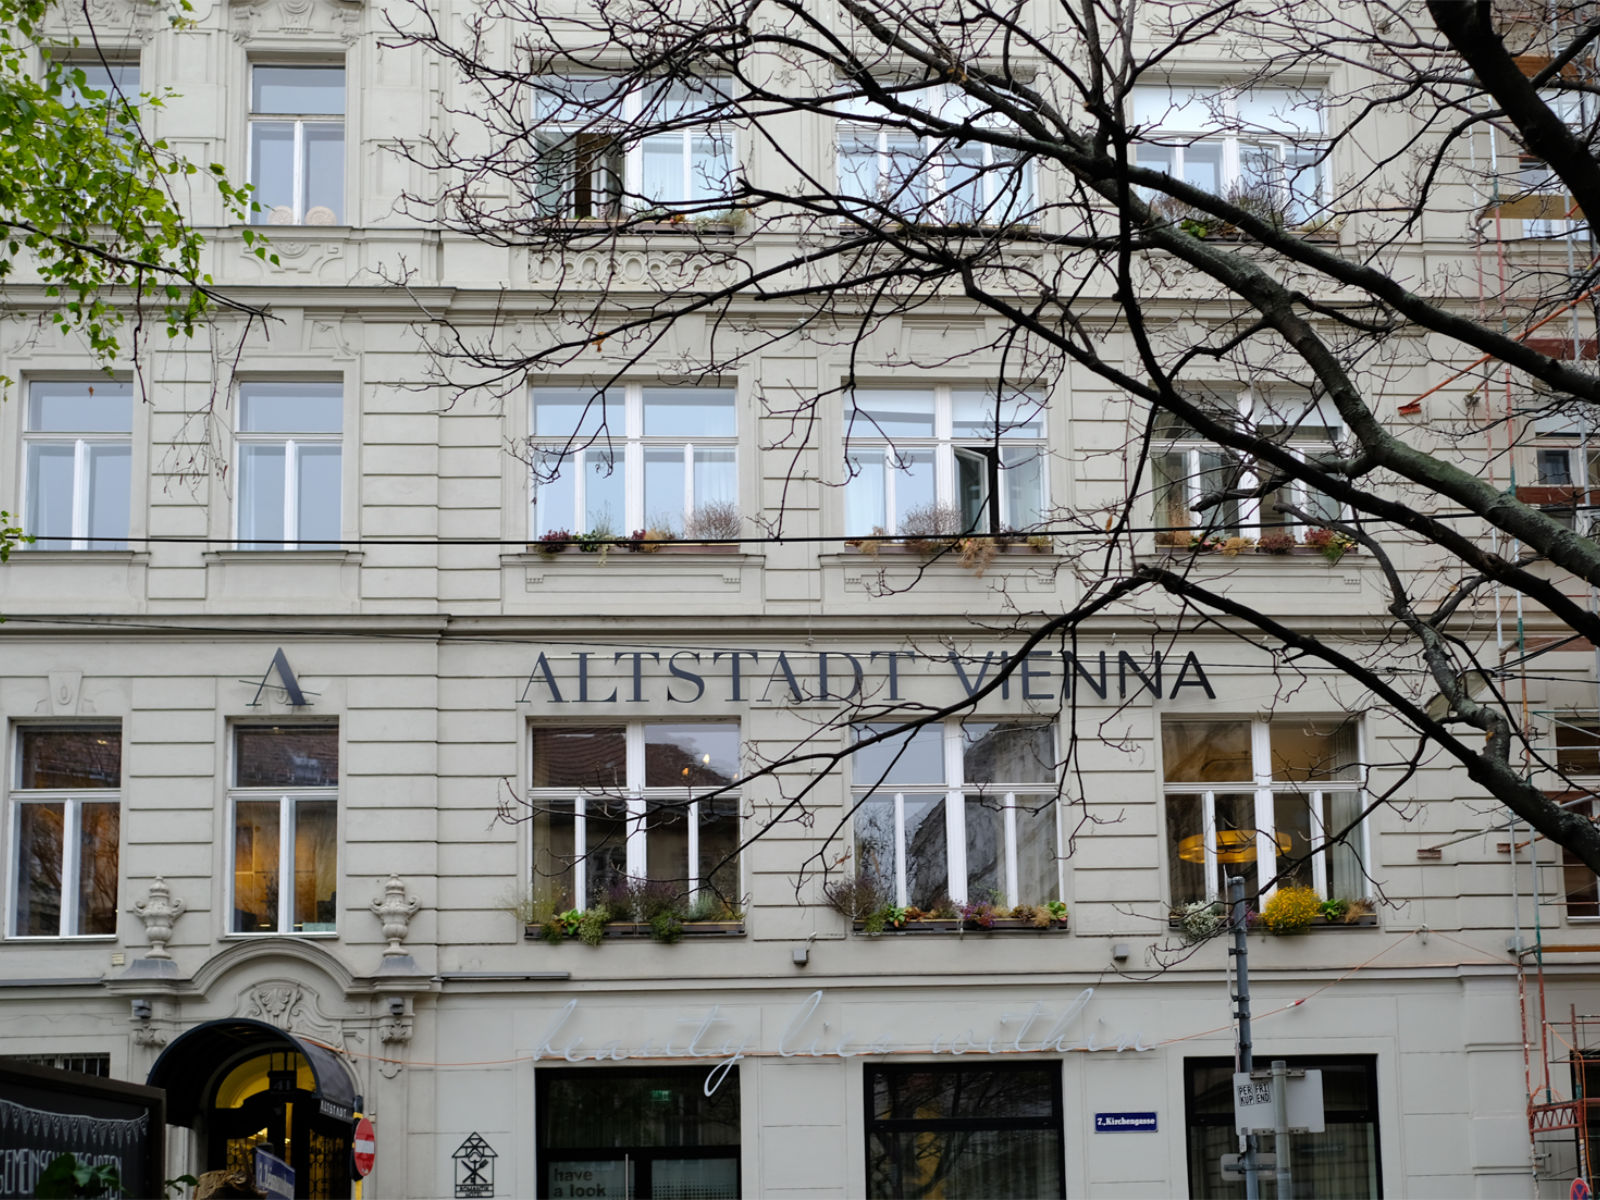 hotel altstadt vienna wiener lebensgef hl am spittelberg anneliwest berlin. Black Bedroom Furniture Sets. Home Design Ideas